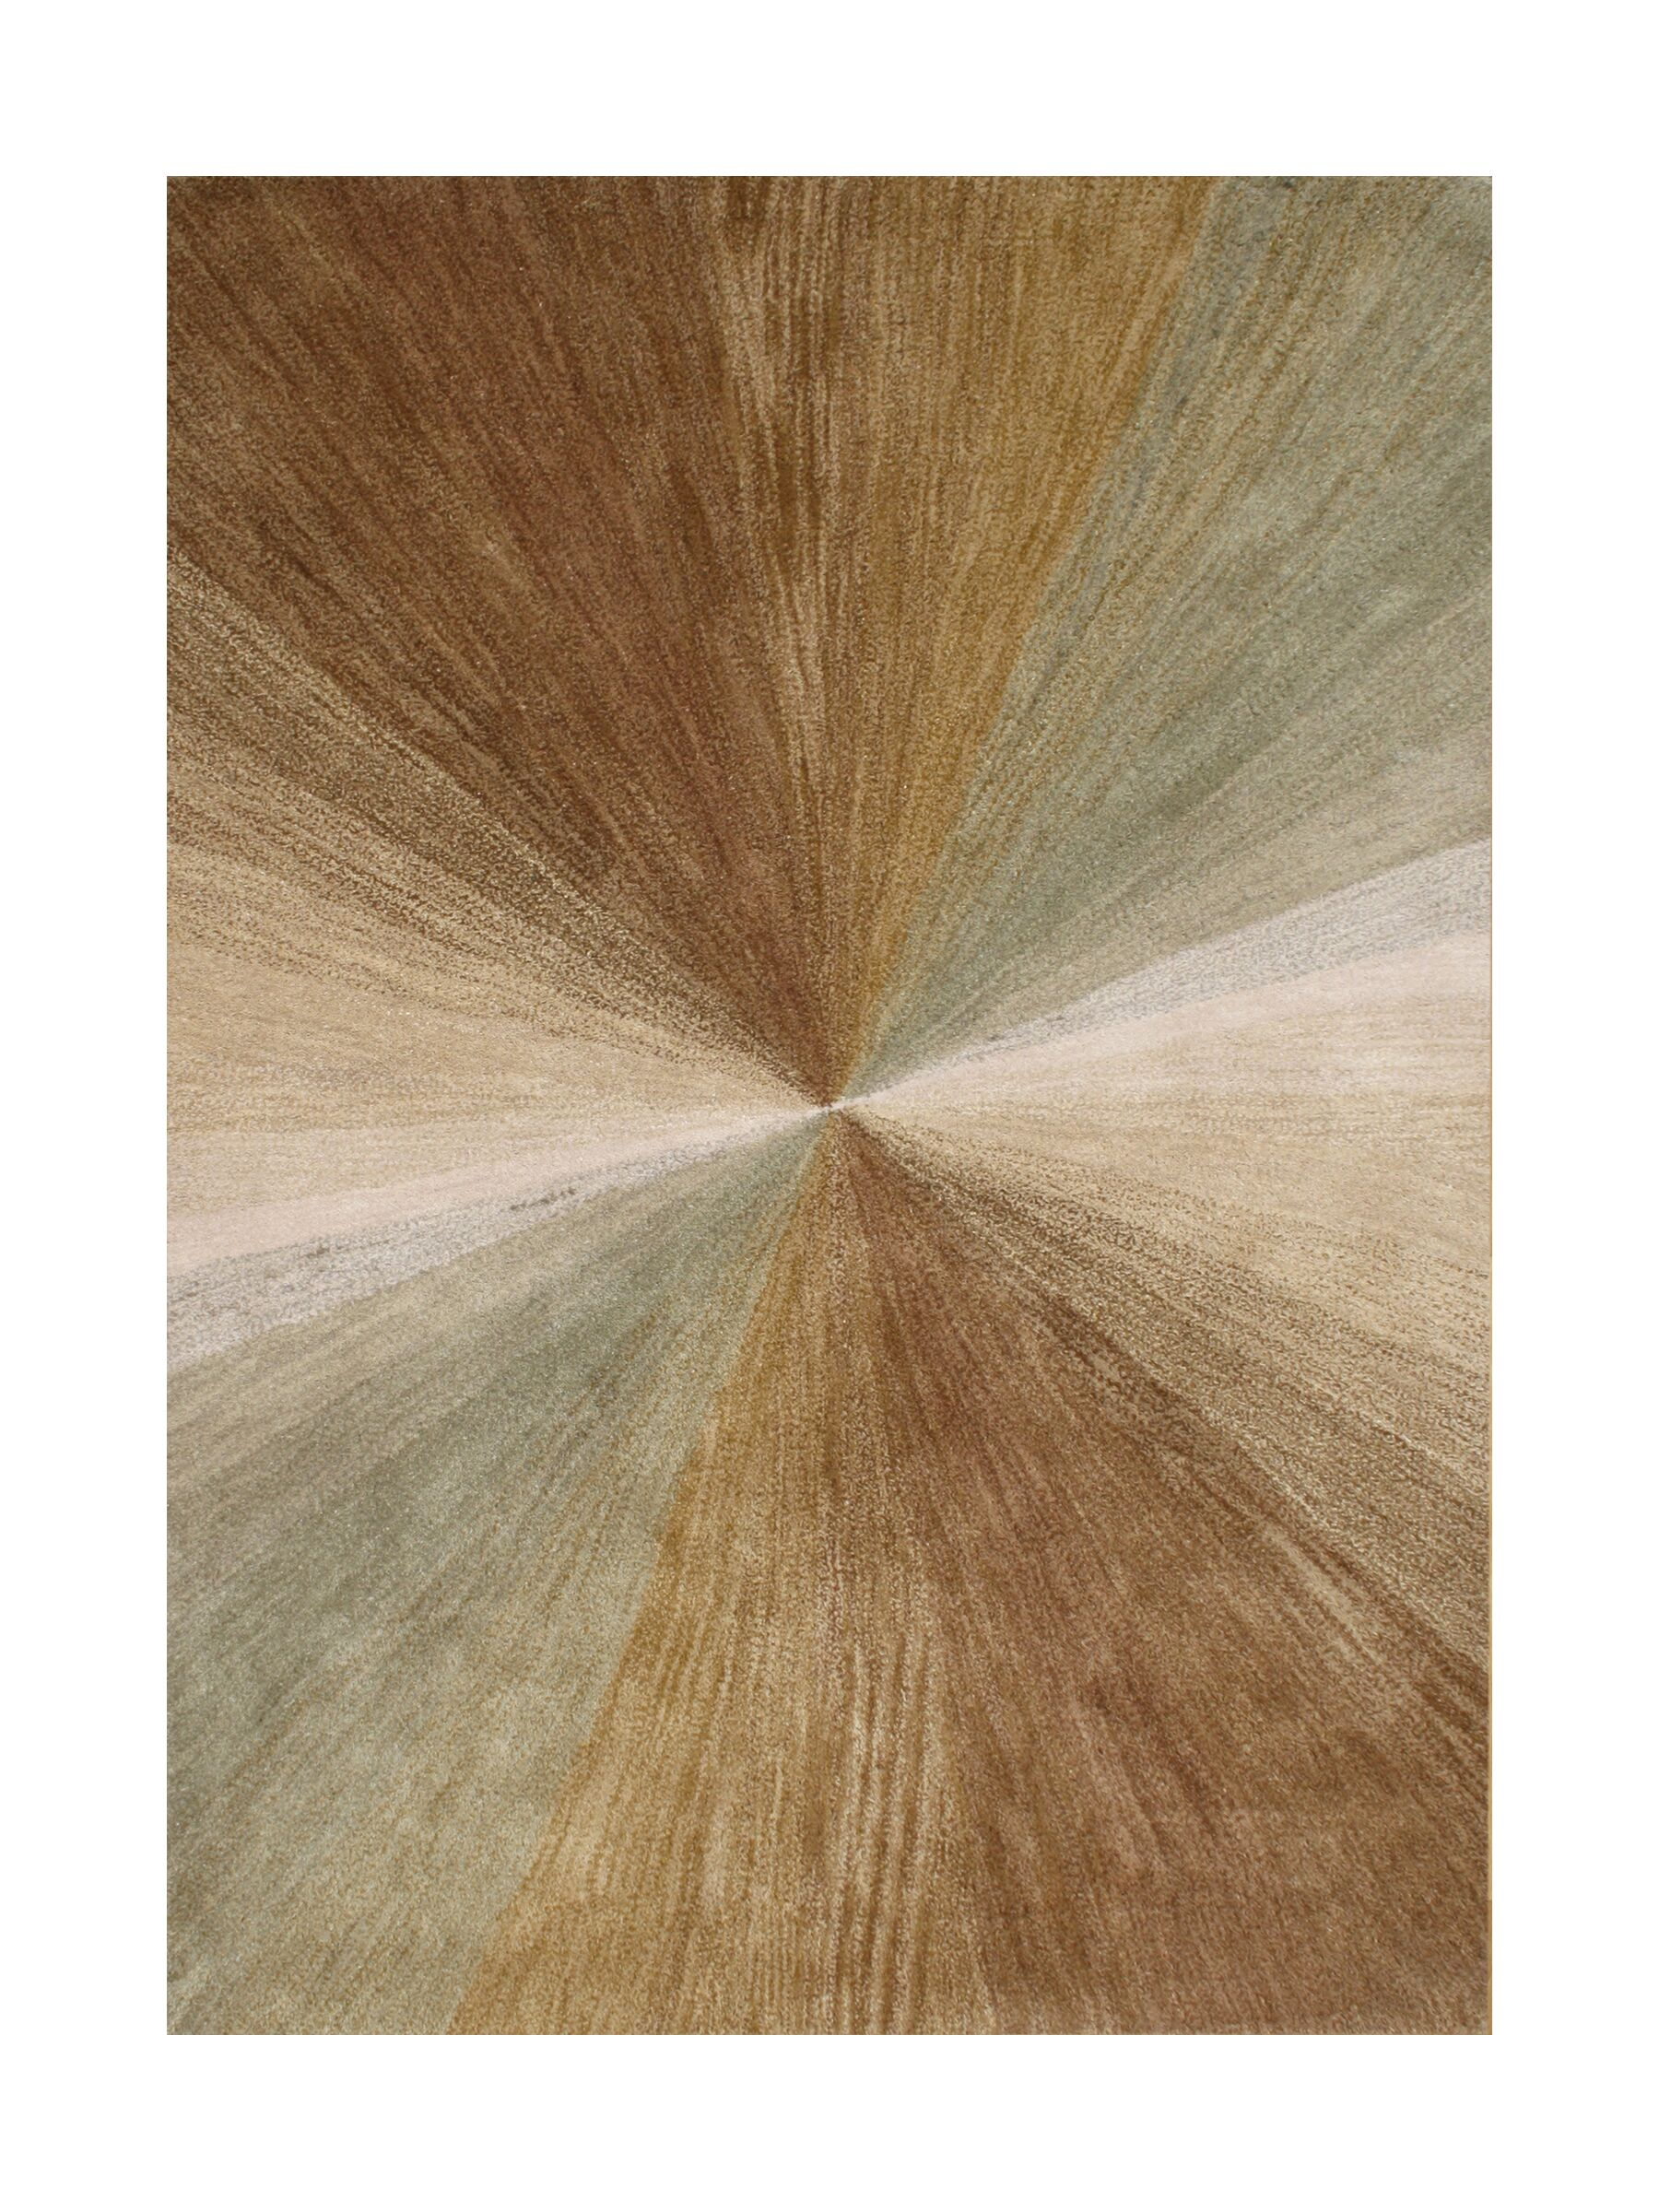 Nagar Hand-Tufted Brown Area Rug Rug Size: Rectangle 8' x 10'